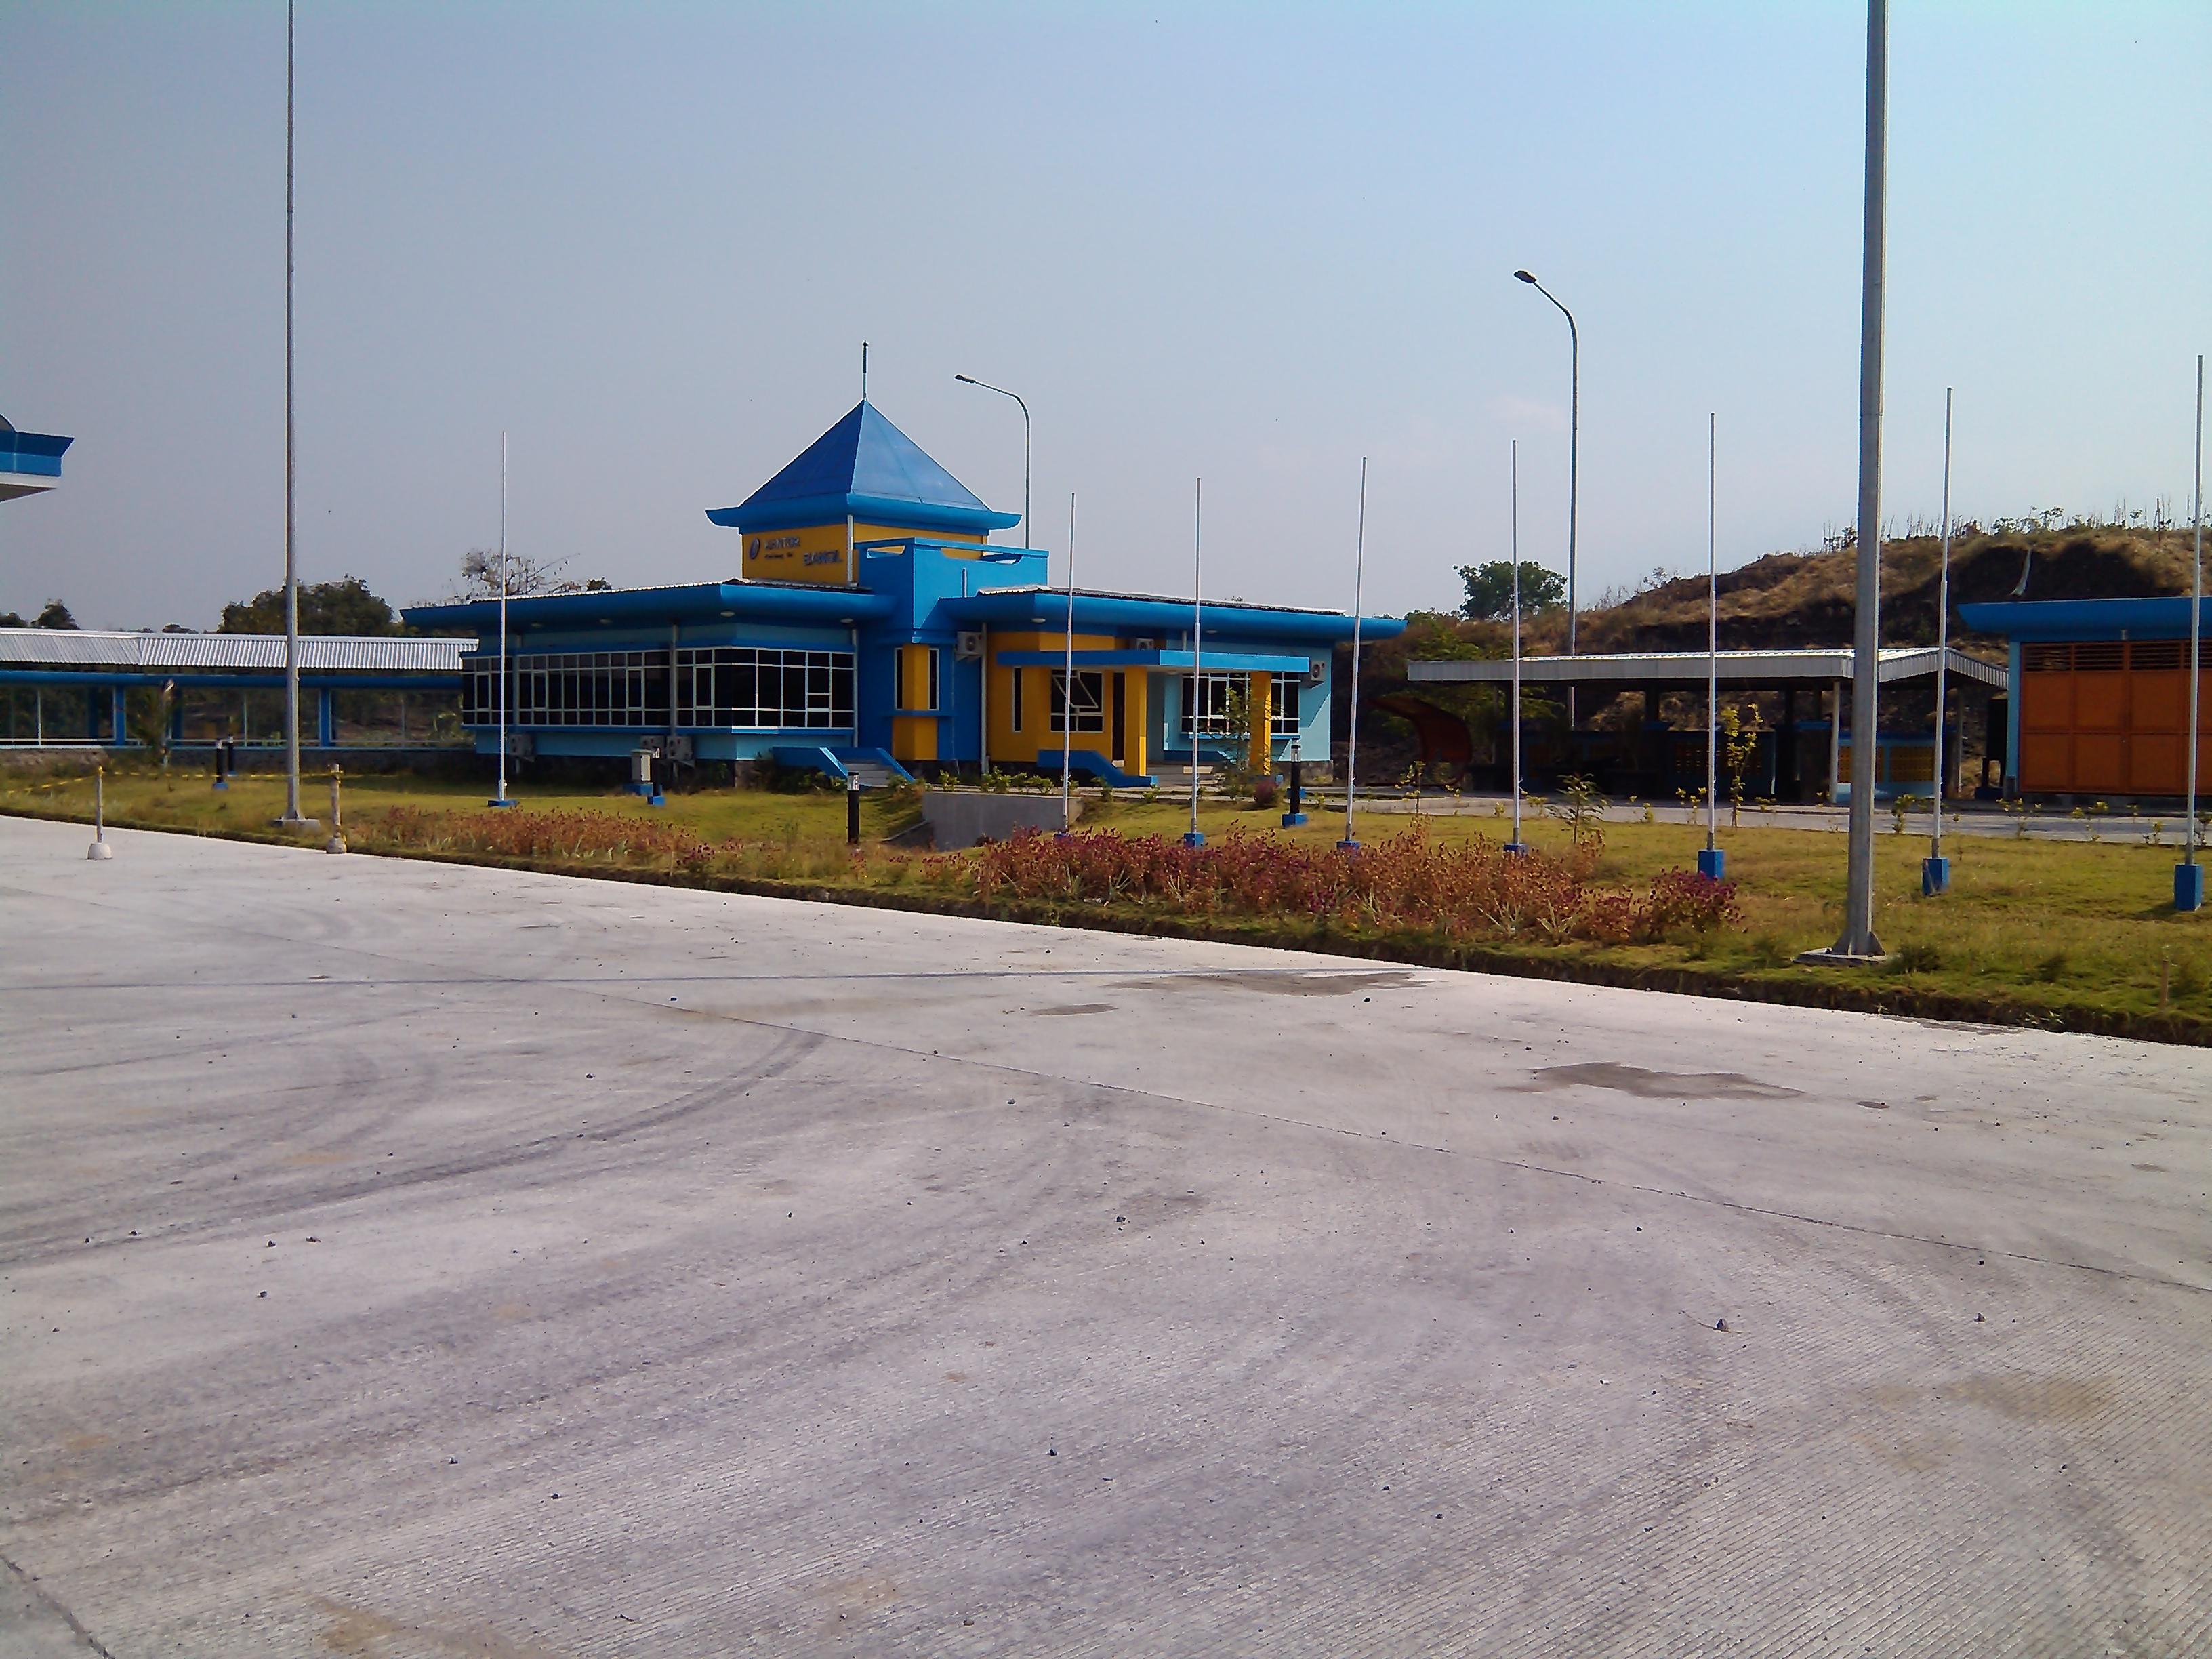 File:Kantor Jalan Tol di Bangil dekat gerbang tol - panoramio.jpg